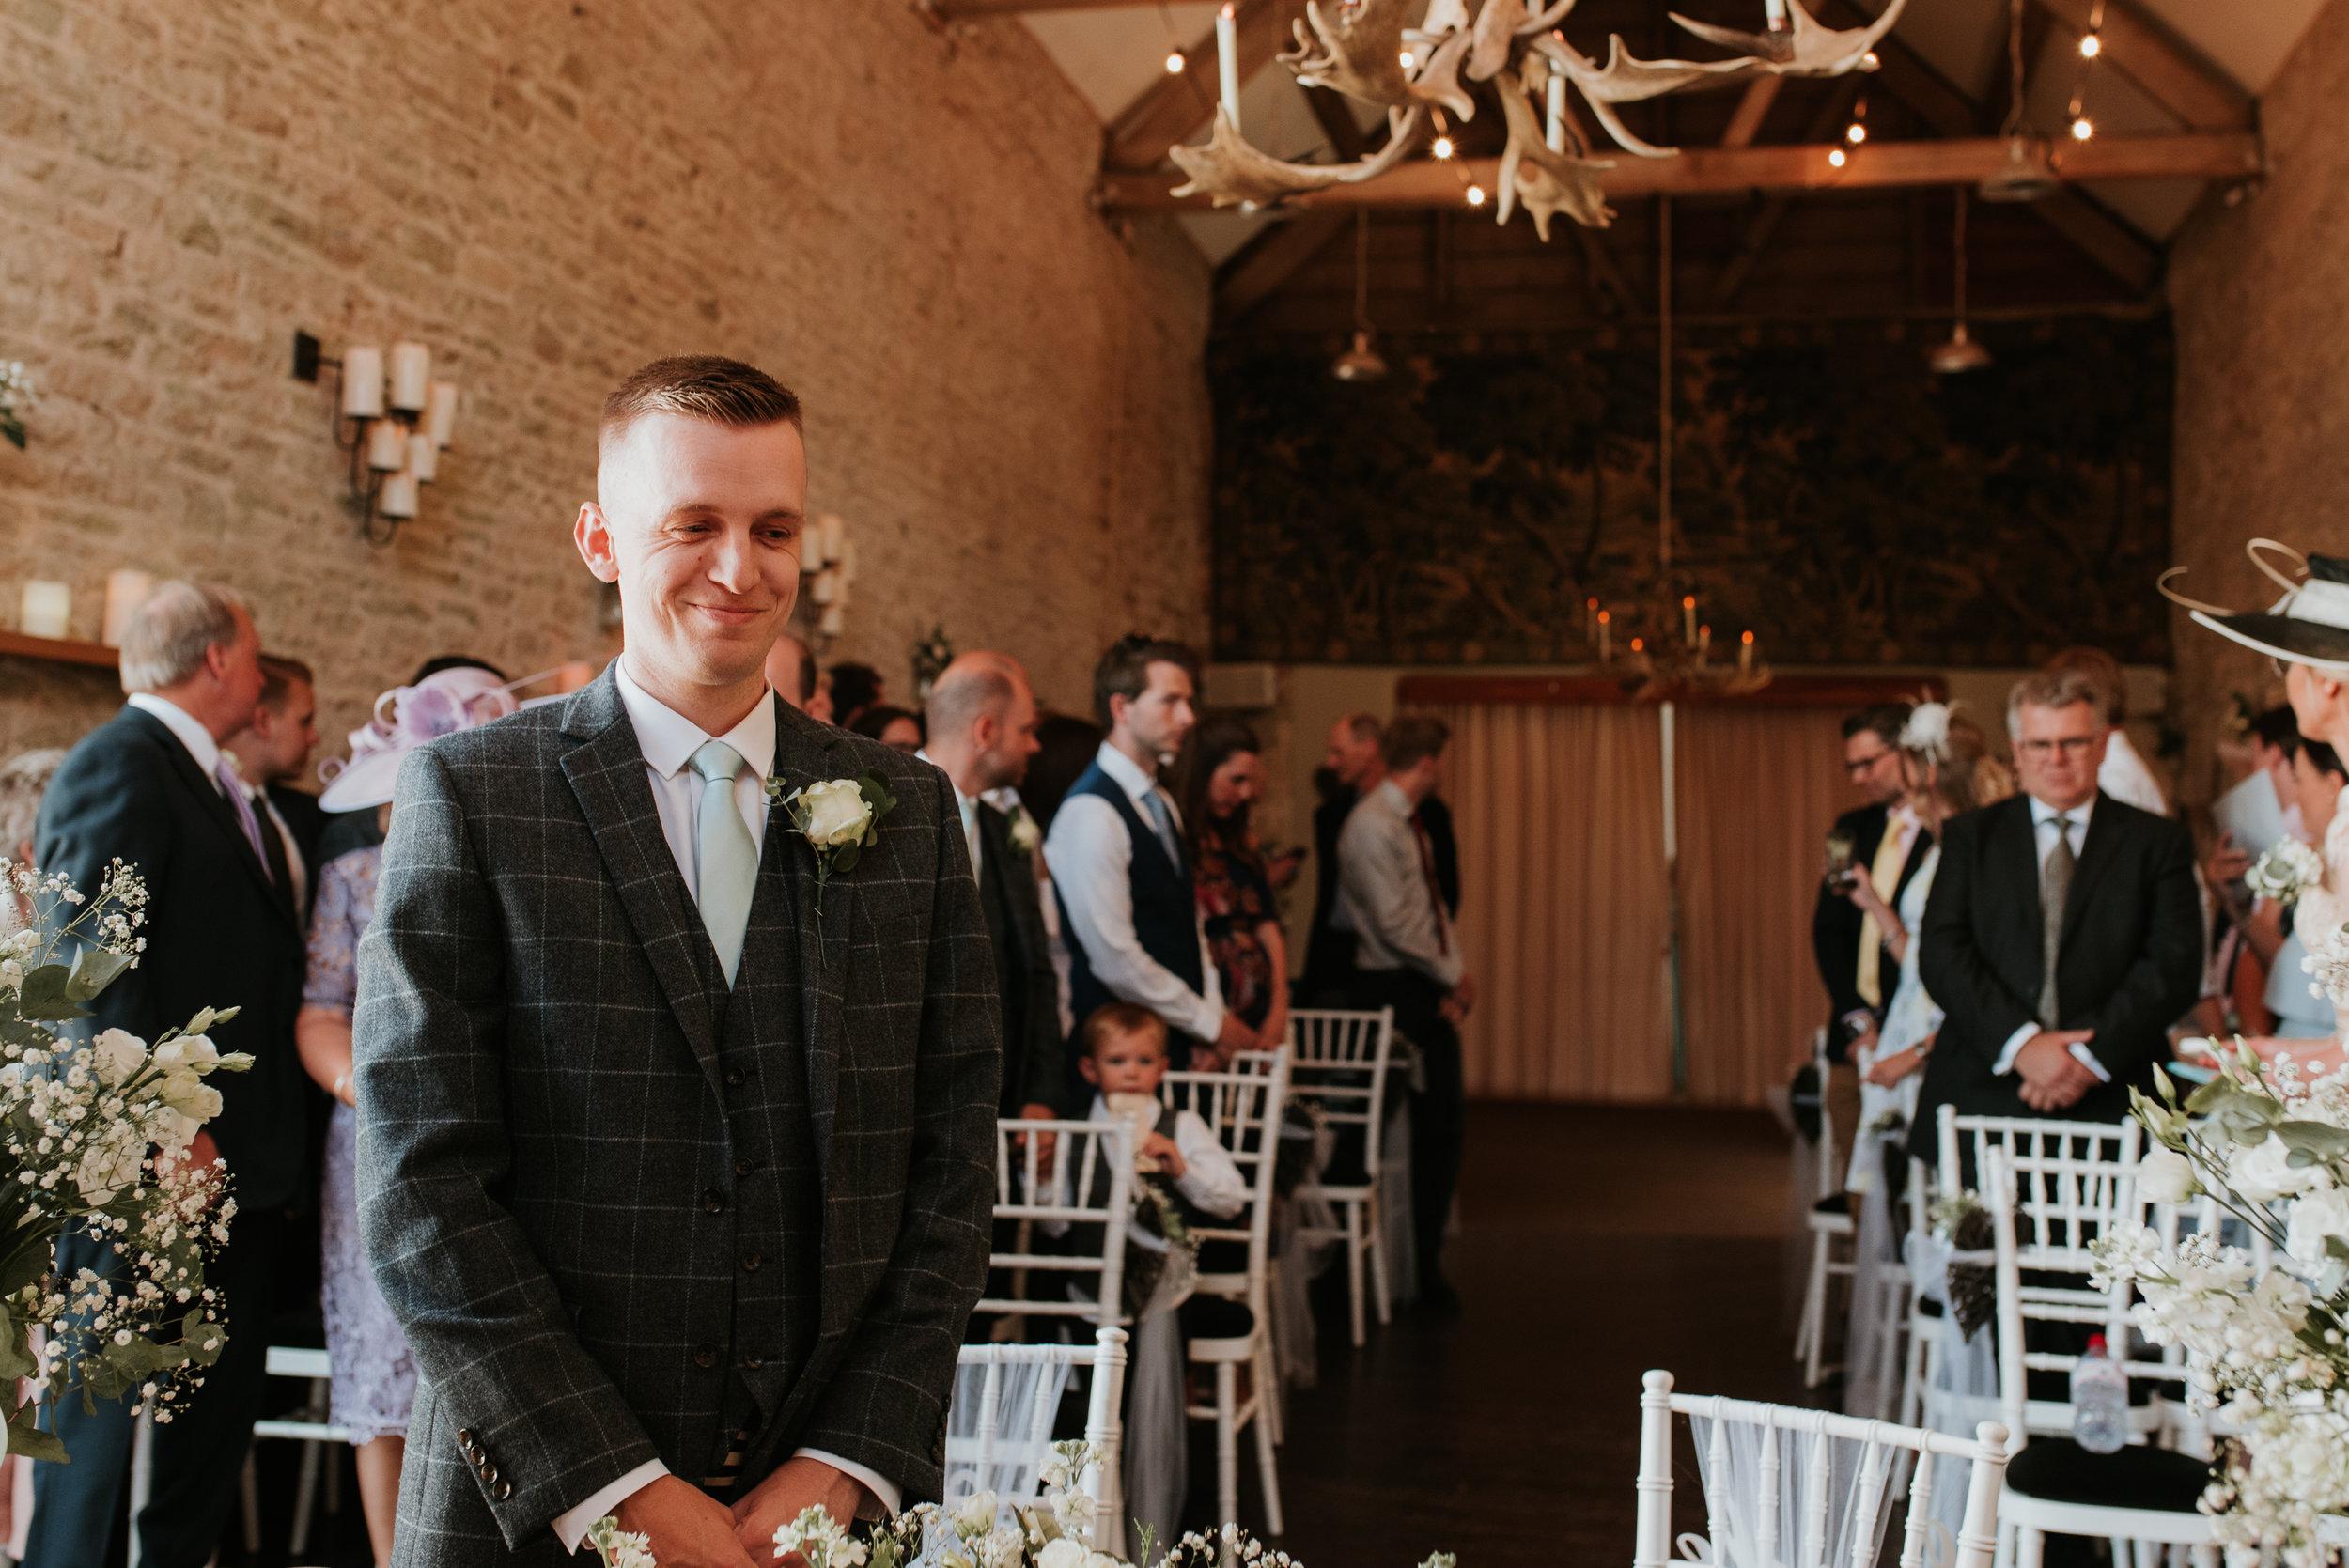 Oxfordshire-wedding-photographer-31.jpg